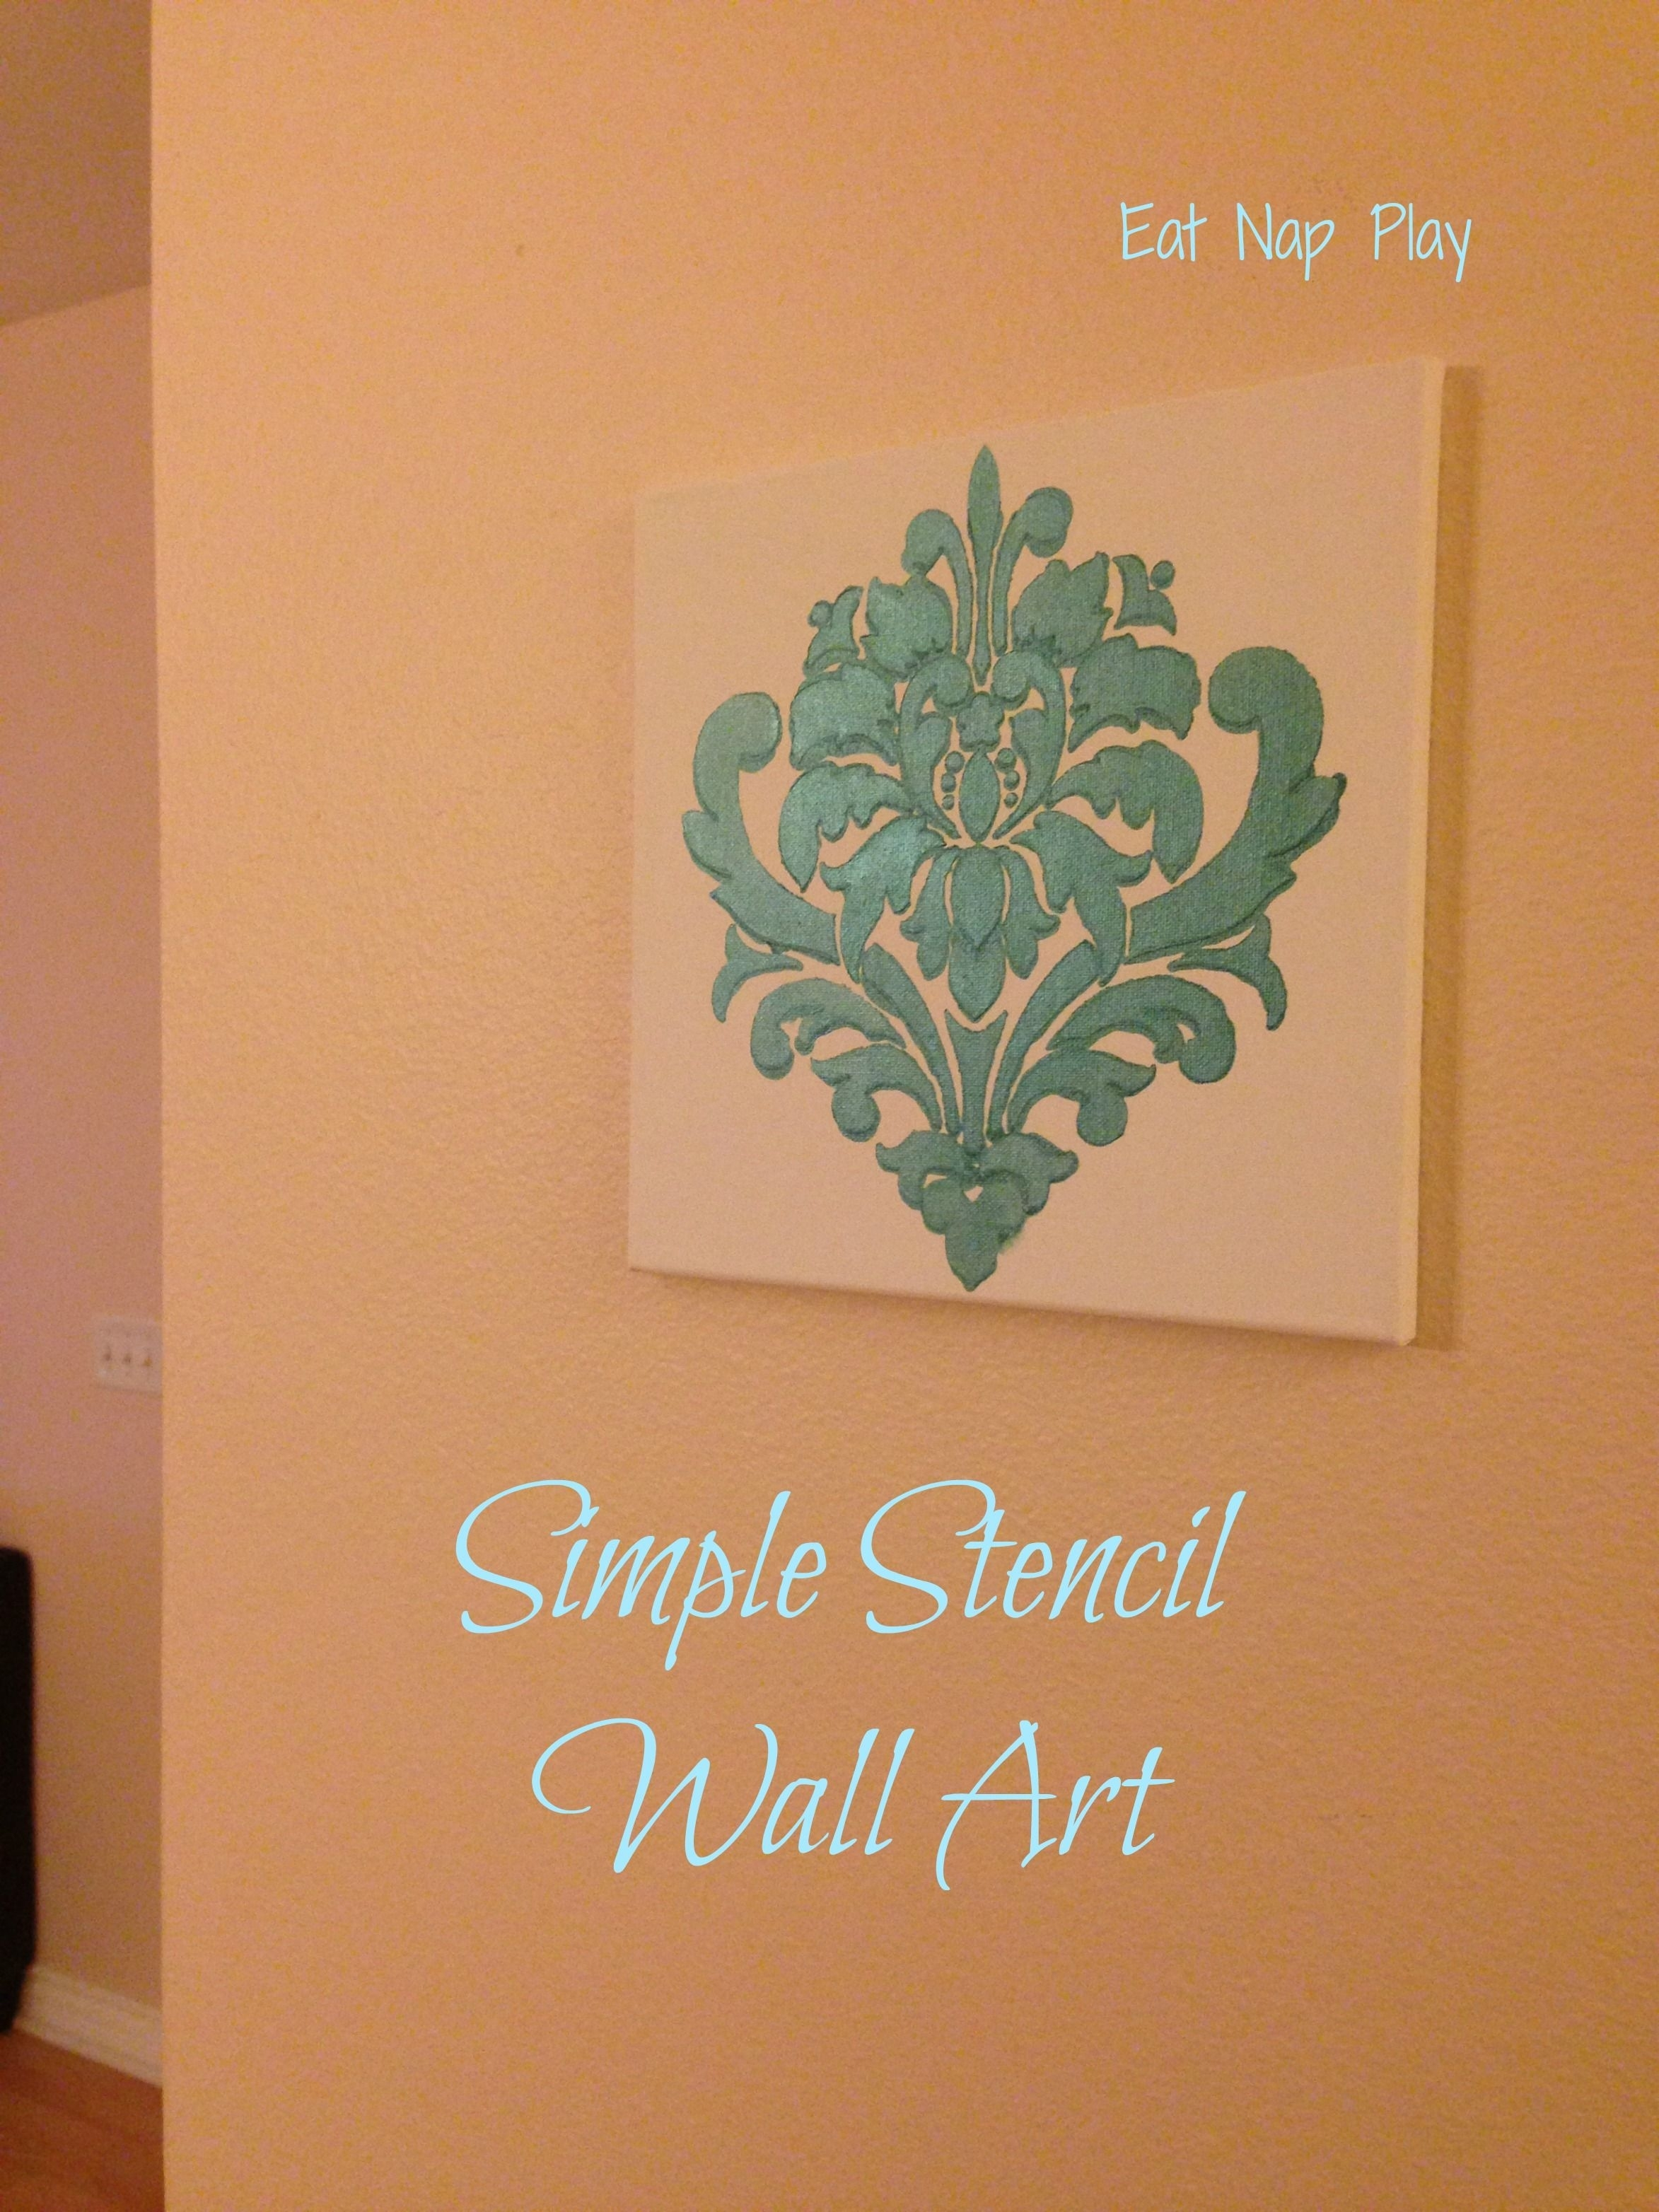 Wall Art (2346×3128) | Stencil | Pinterest | Stenciling For Stencil Wall Art (Photo 11 of 20)